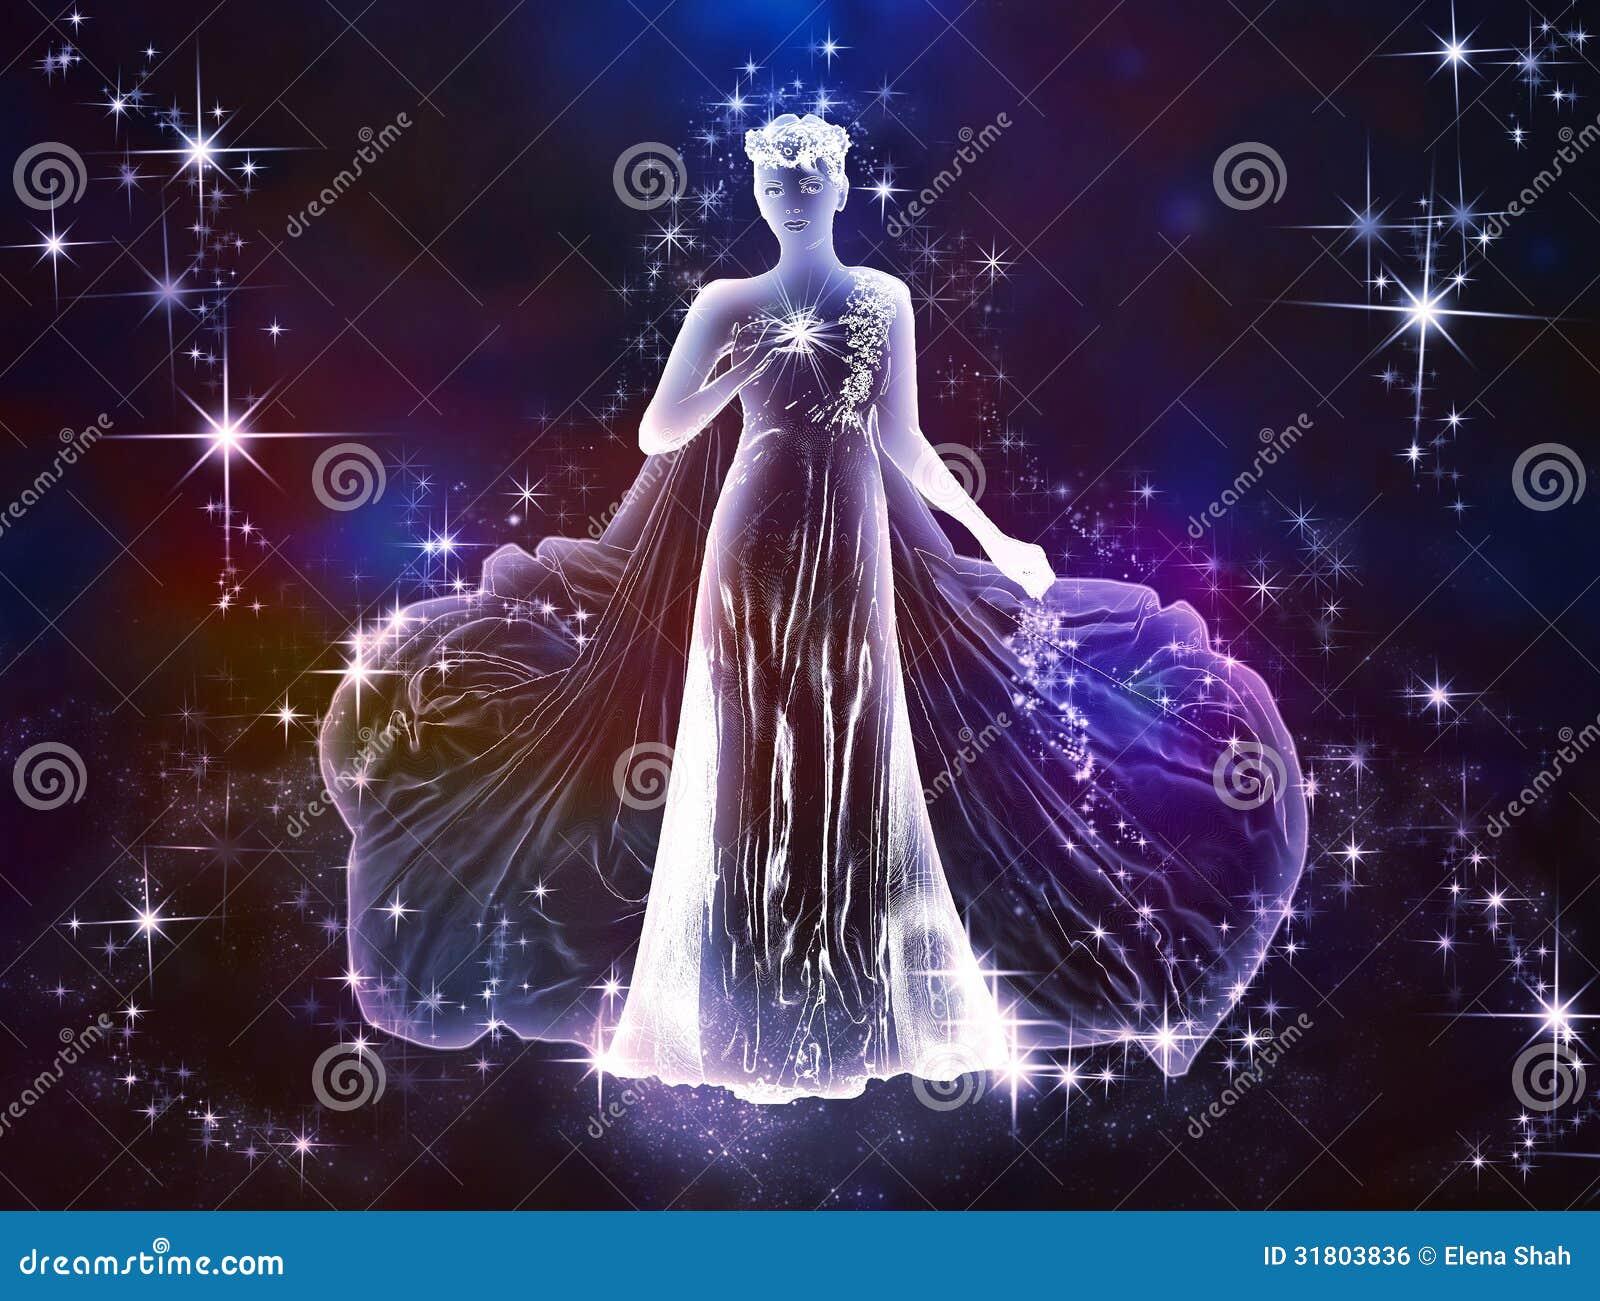 Virgo Maiden Royalty Free Stock Image Image 31803836